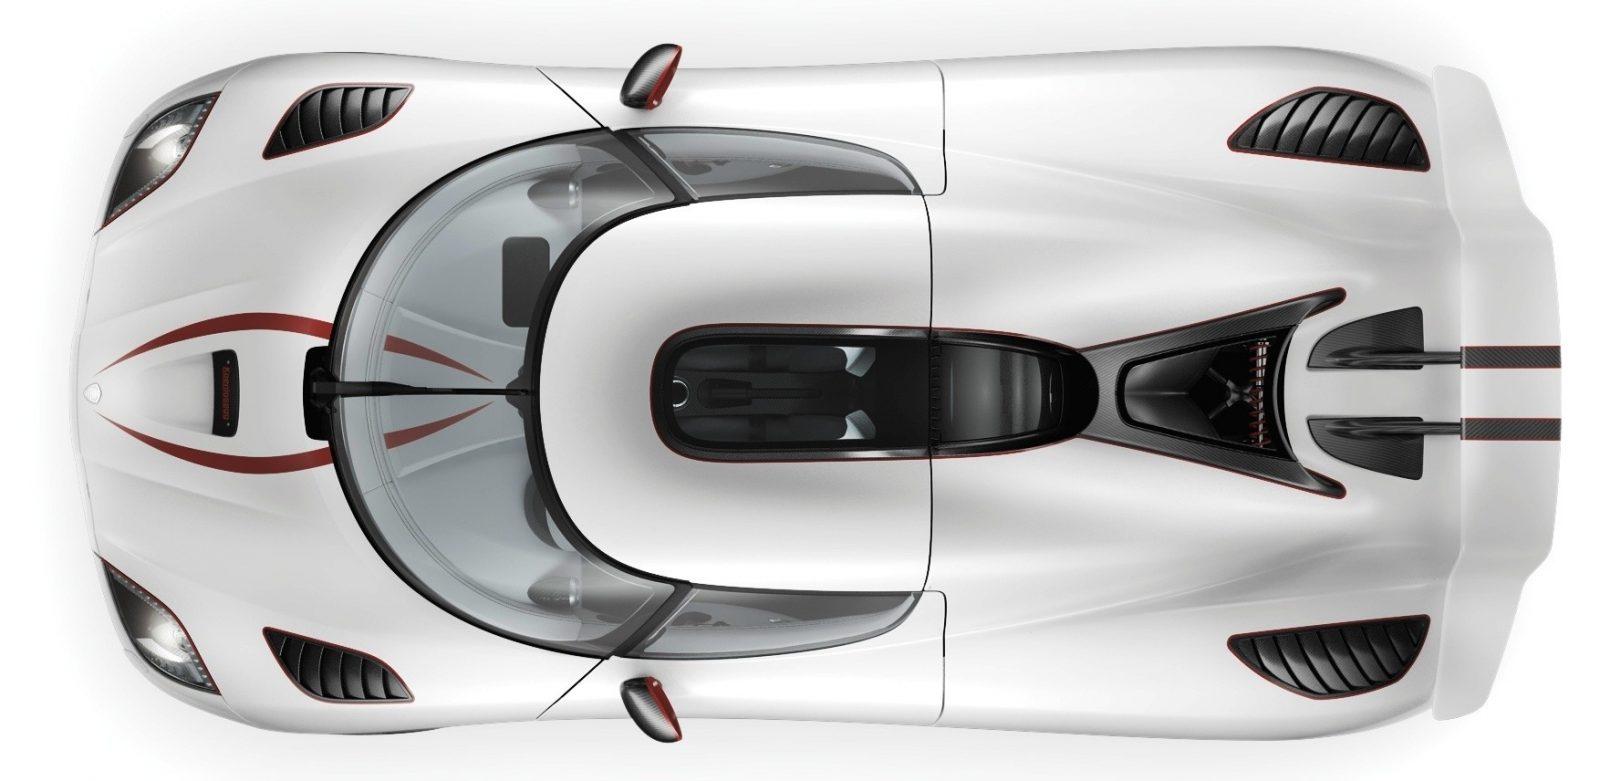 Koenigsegg Agera R Adds 240HP for Potential 280MPH Vmax of Generva-bound One1 Edition26